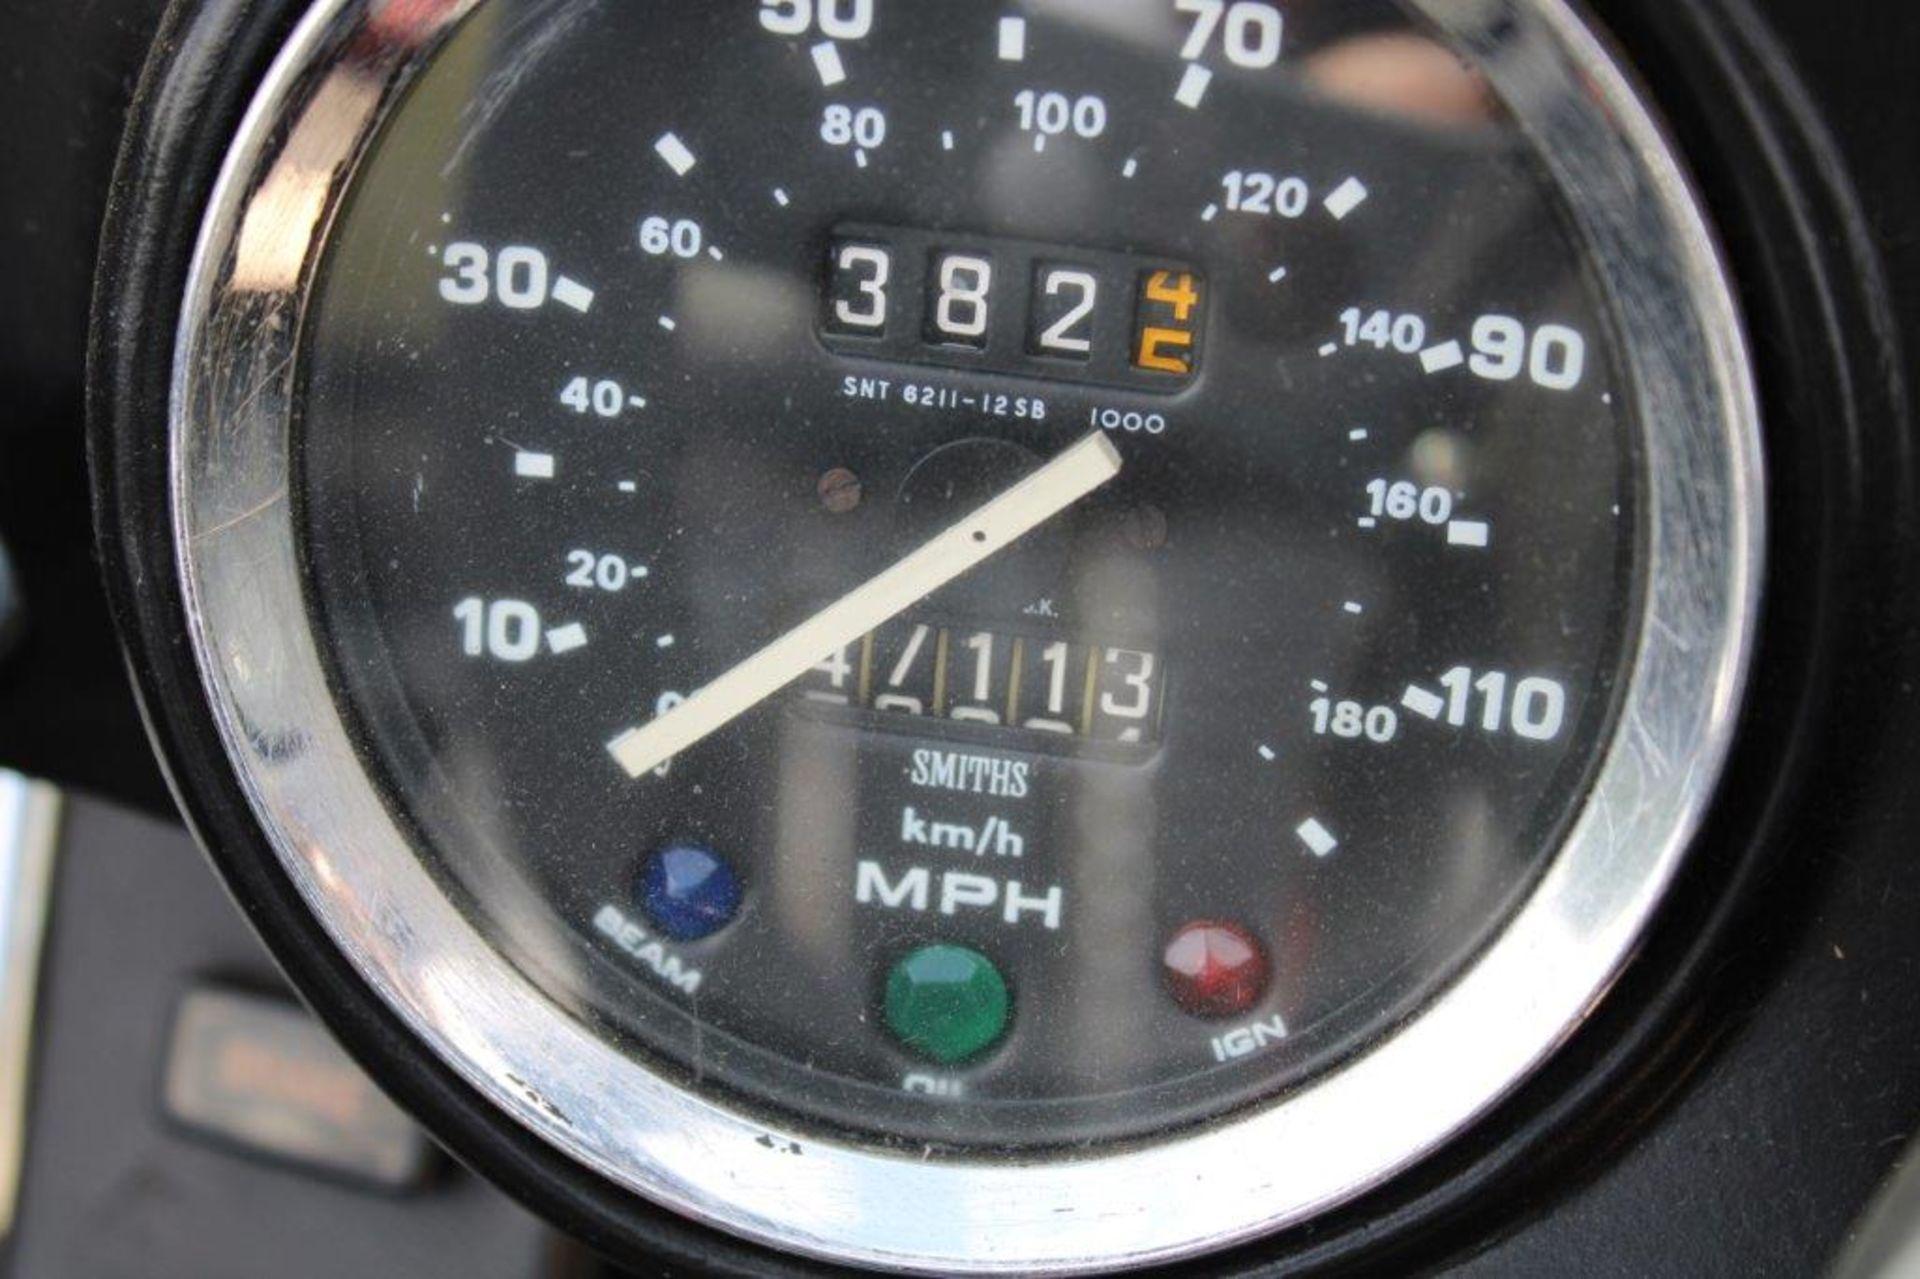 1979 MG Midget 1500 - Image 20 of 37